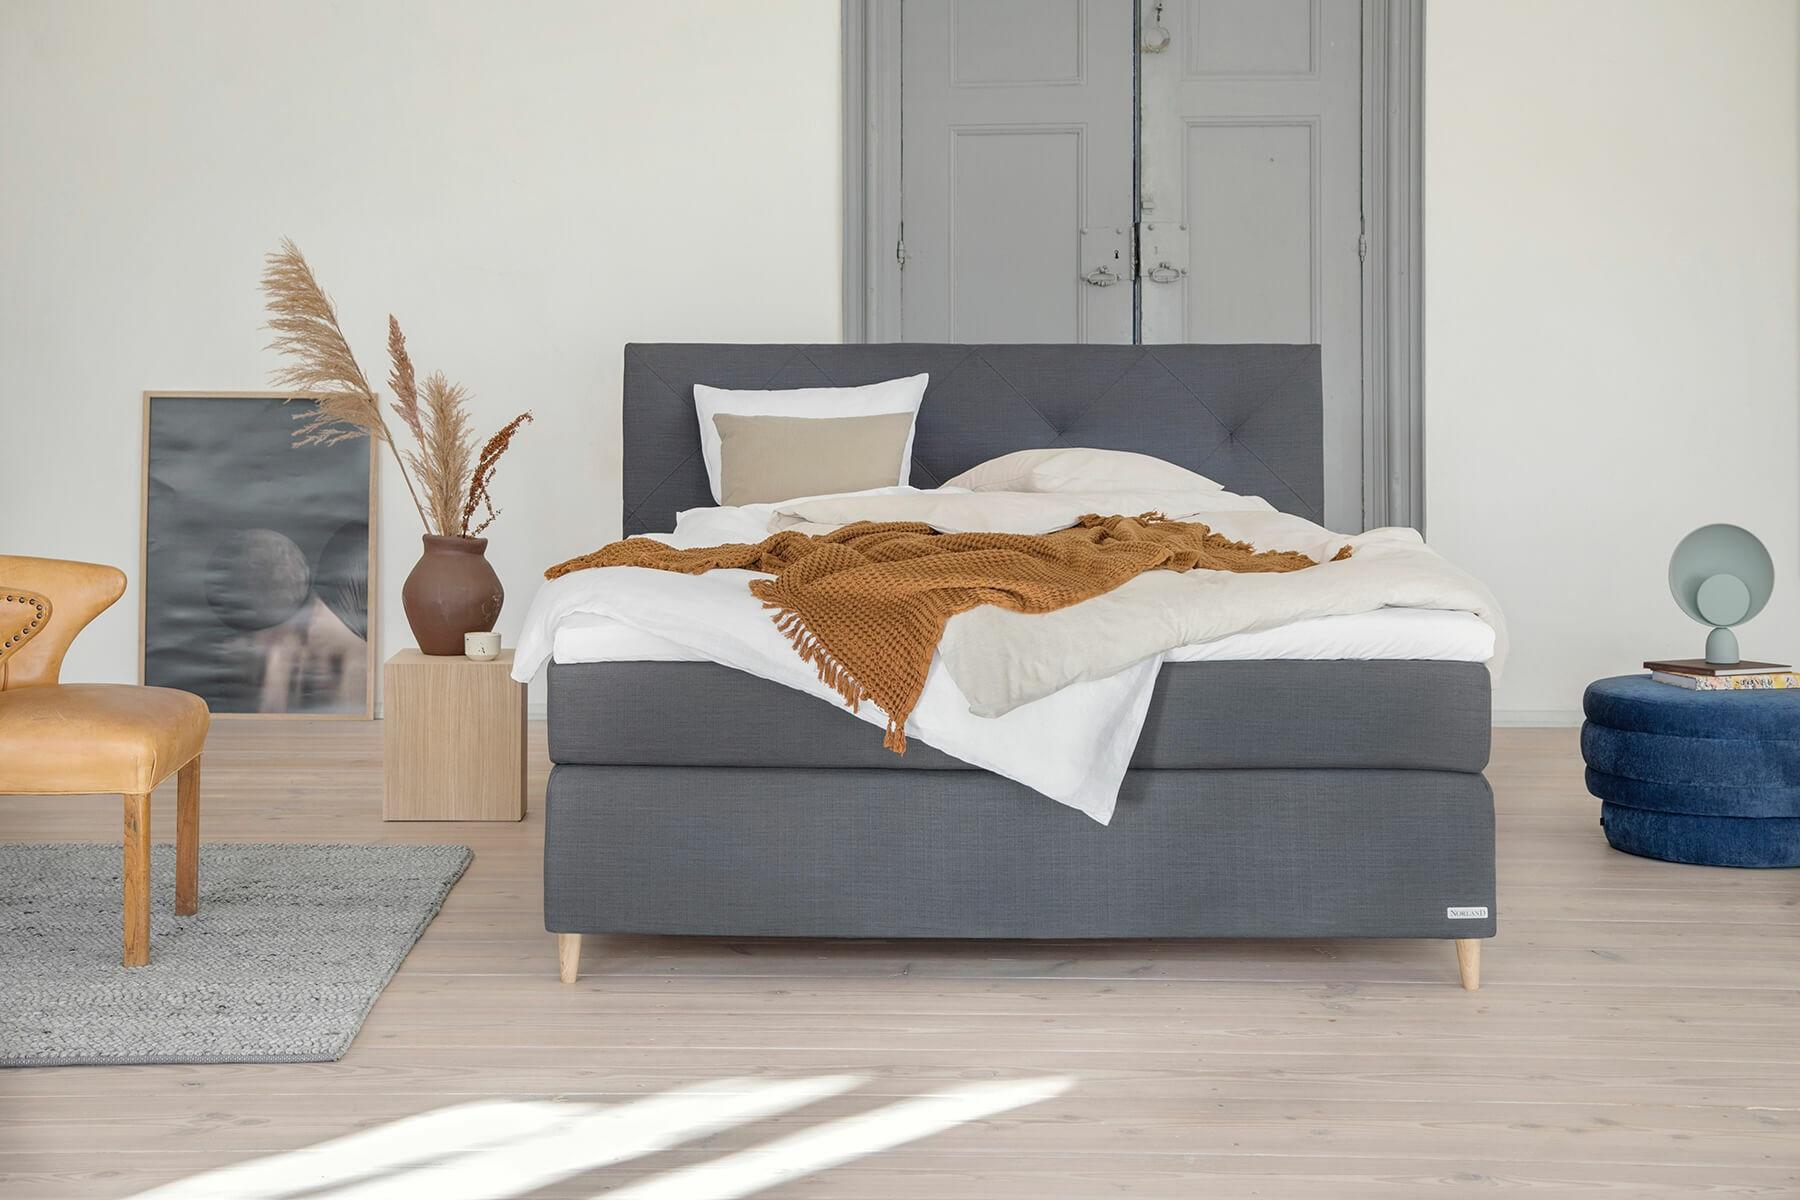 Norhland Dreamline Luksus Komfort